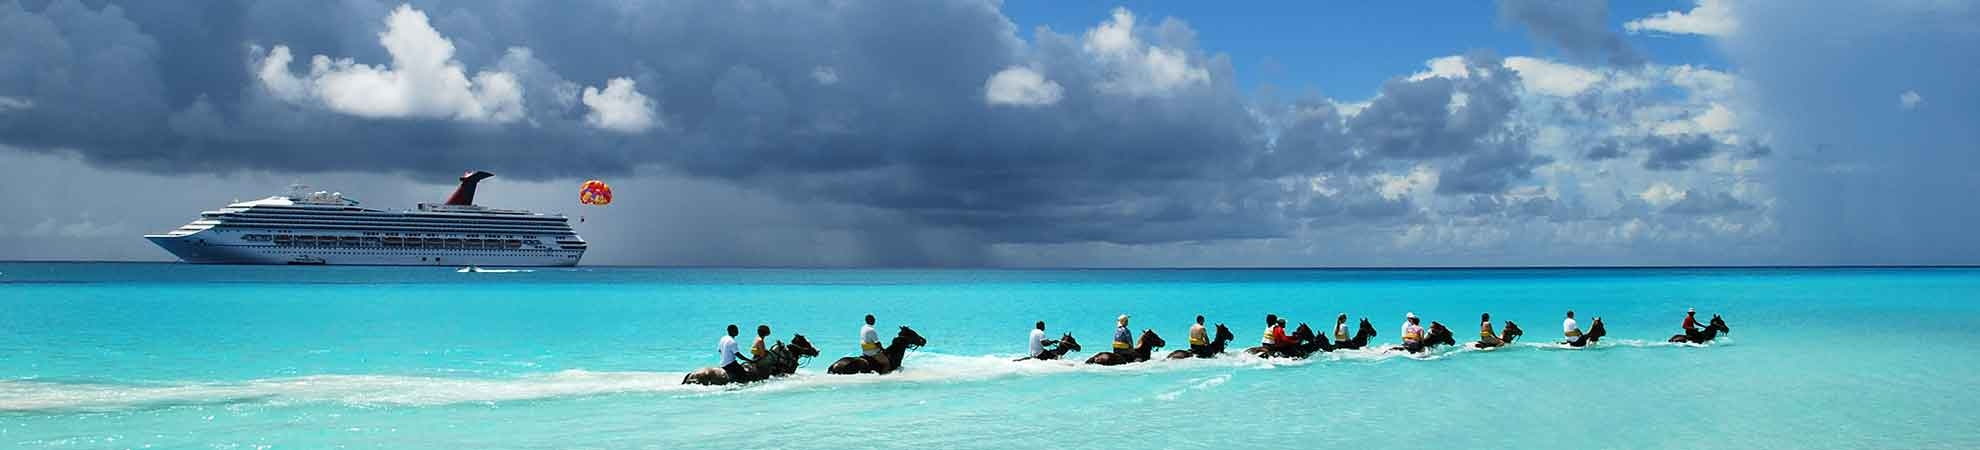 Fiche pays Bahamas